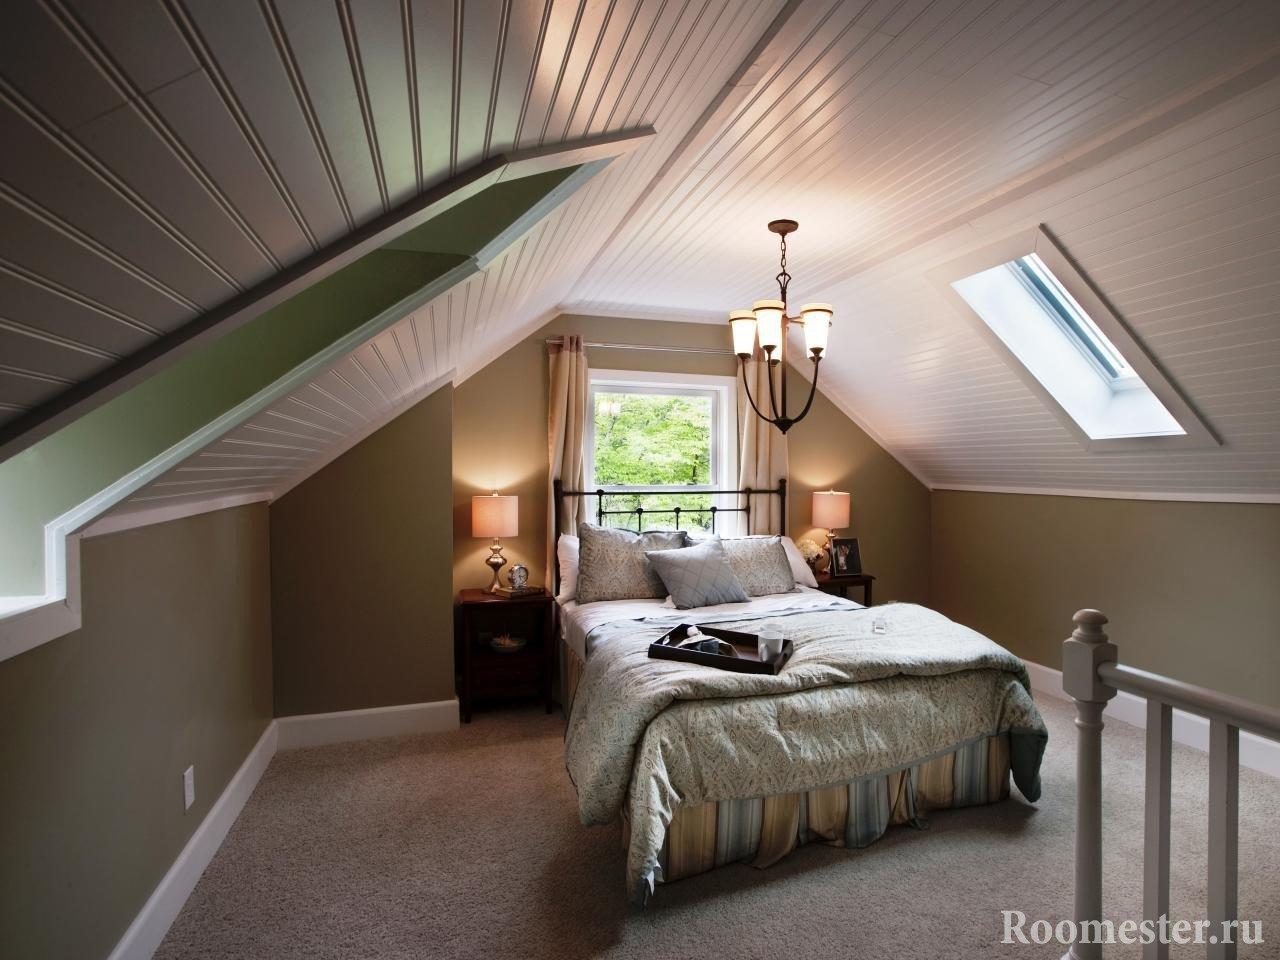 Лампы на тумбочке у кровати